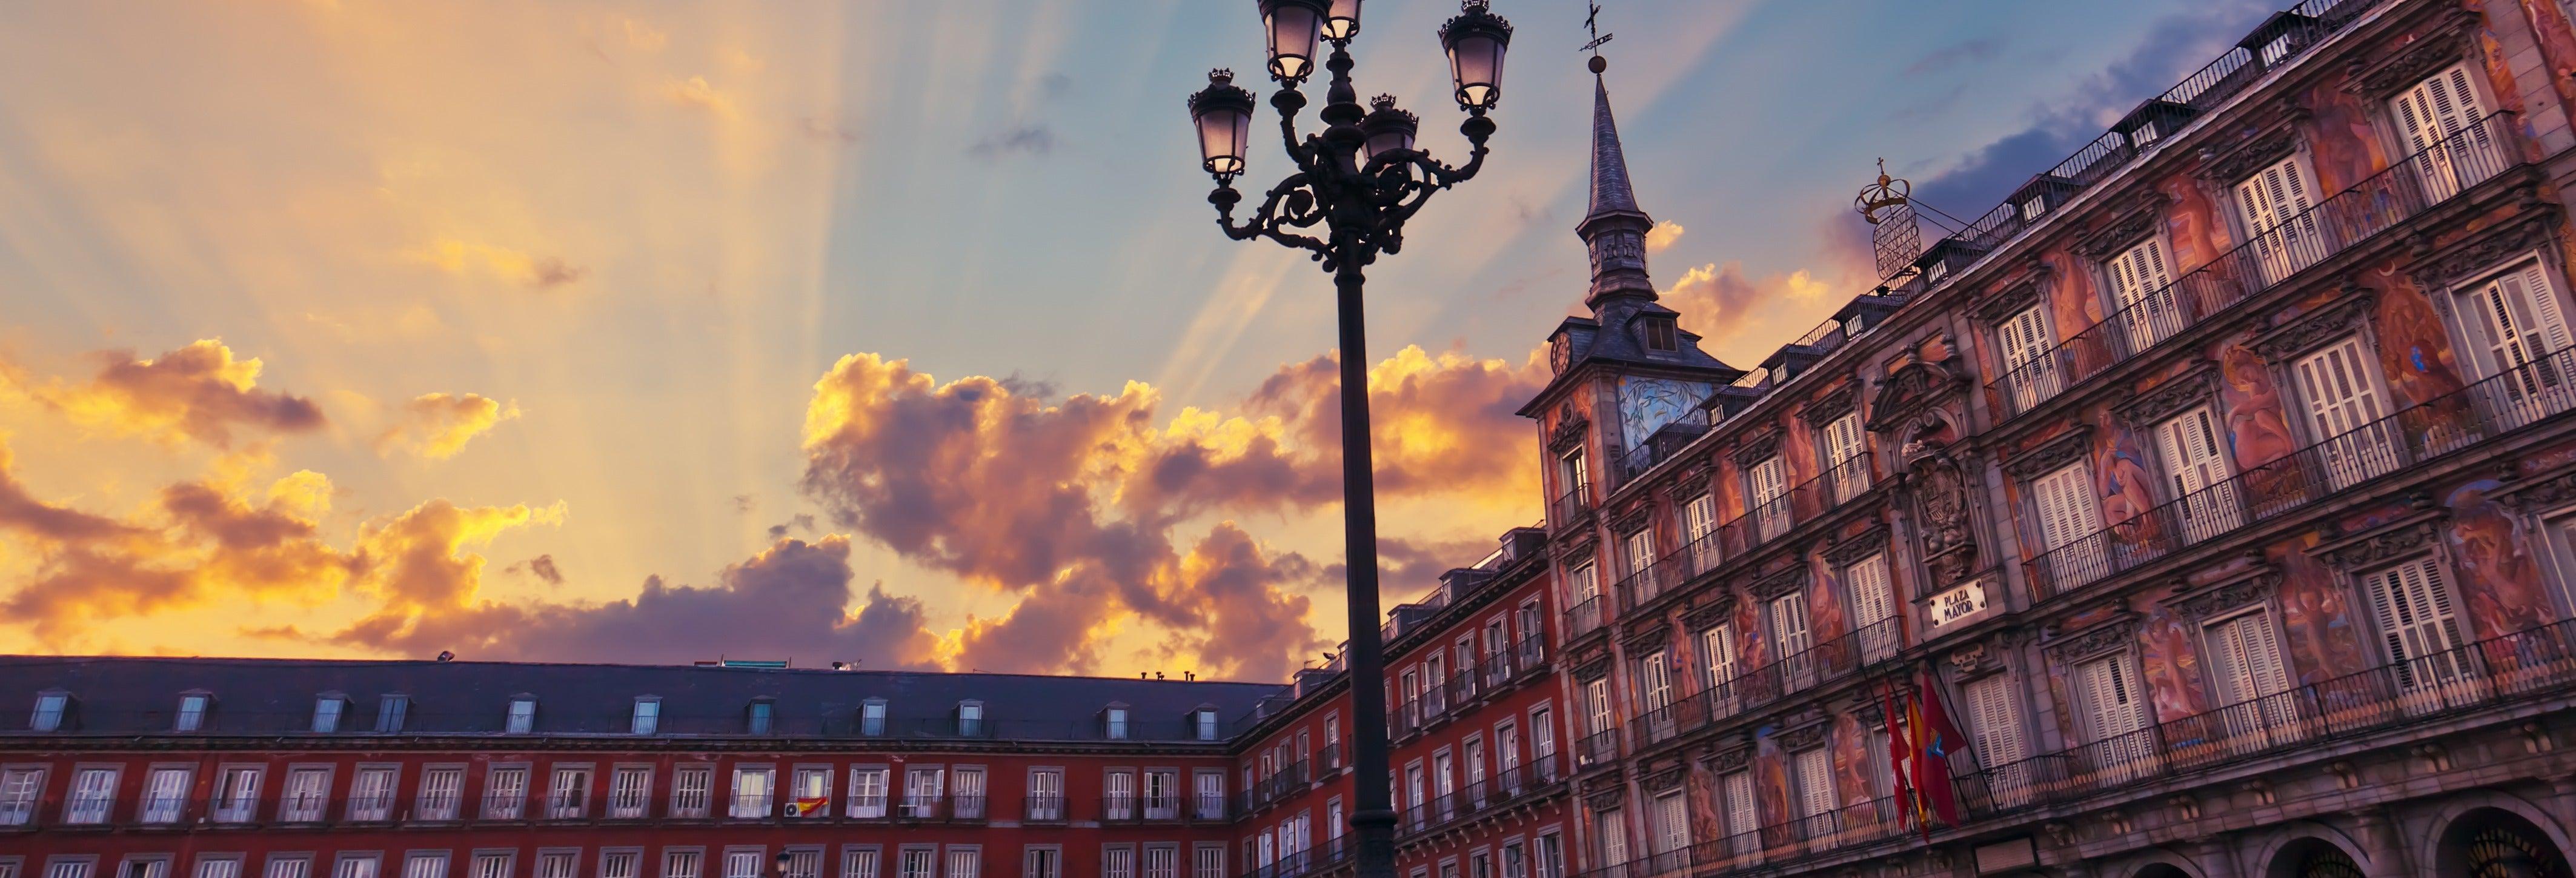 Visita guidata di Madrid da Leggenda